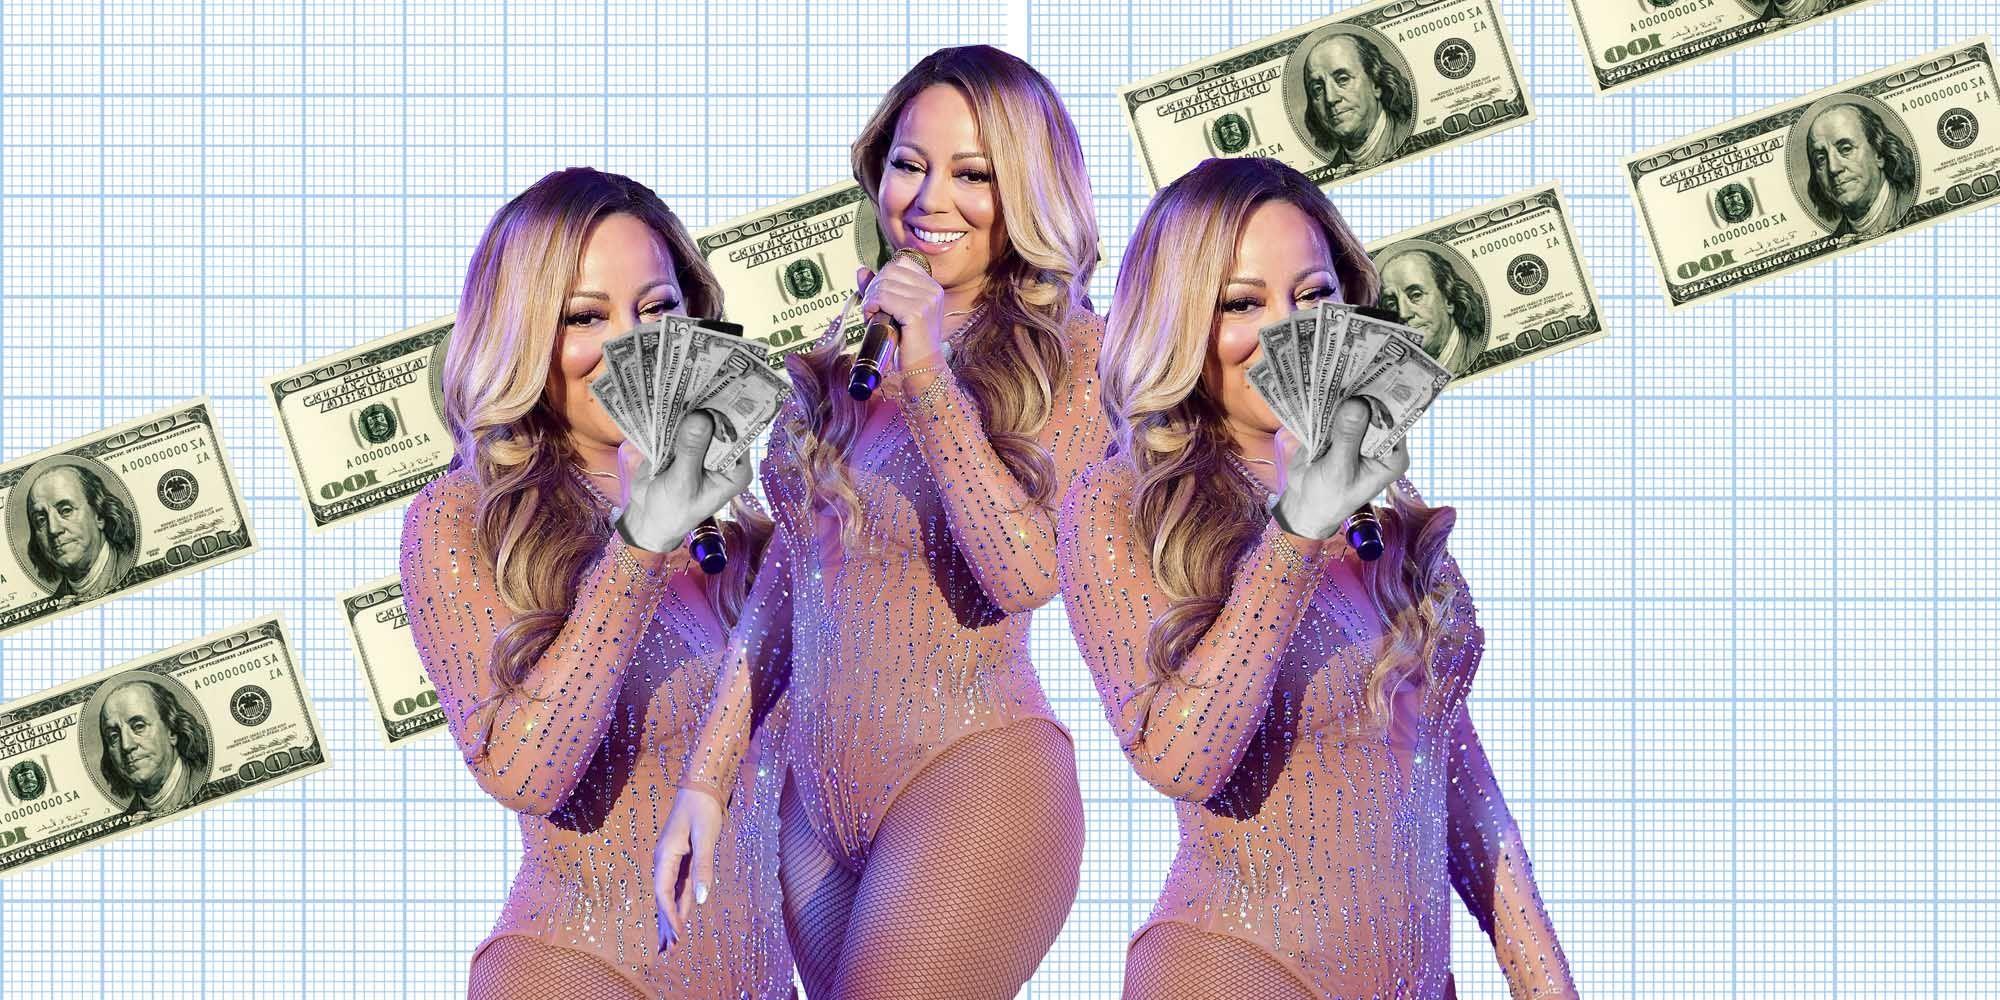 MariahCarey, geld